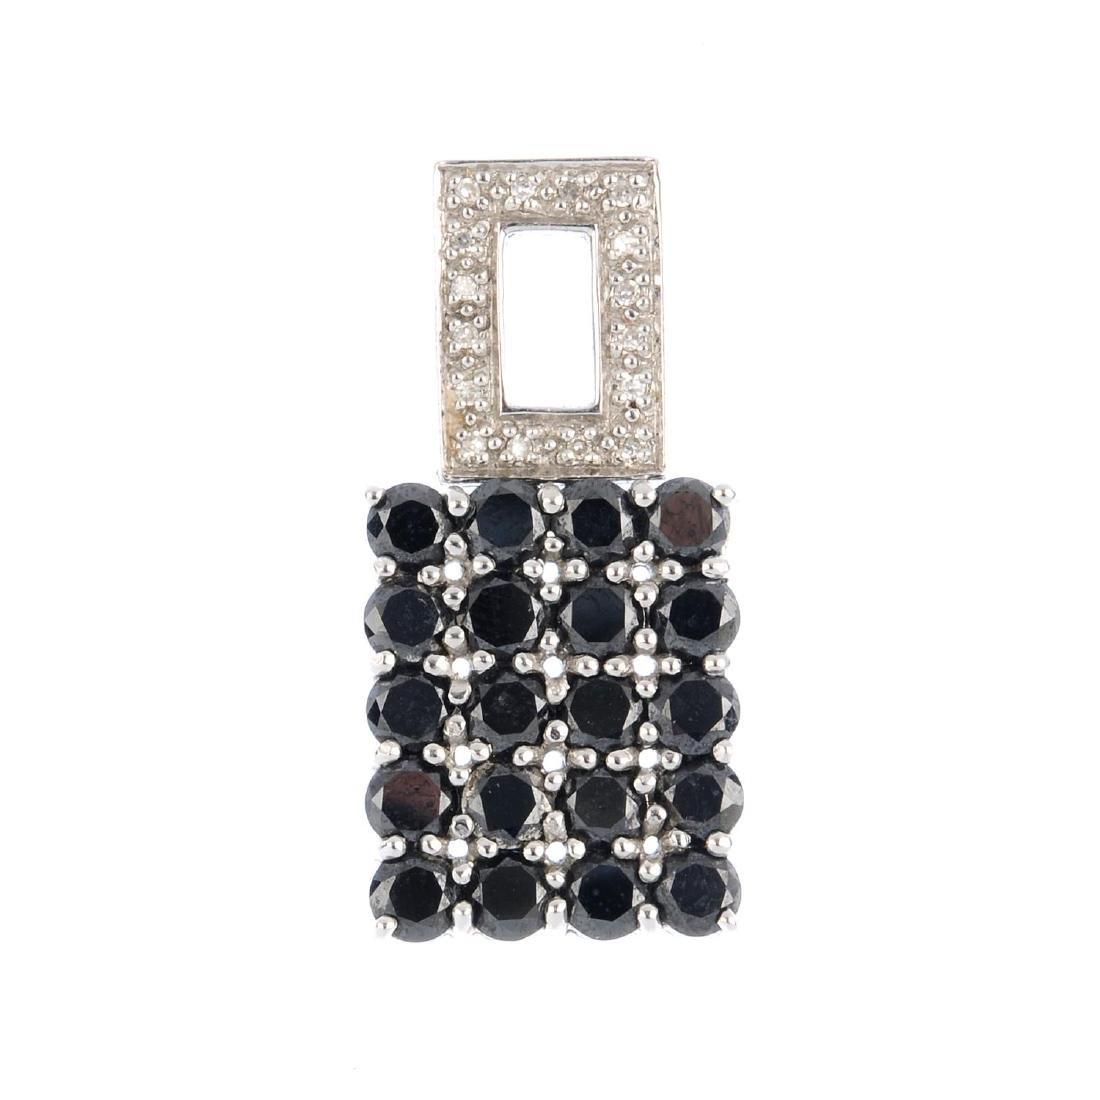 A 14ct gold diamond and gem-set pendant. Designed as a